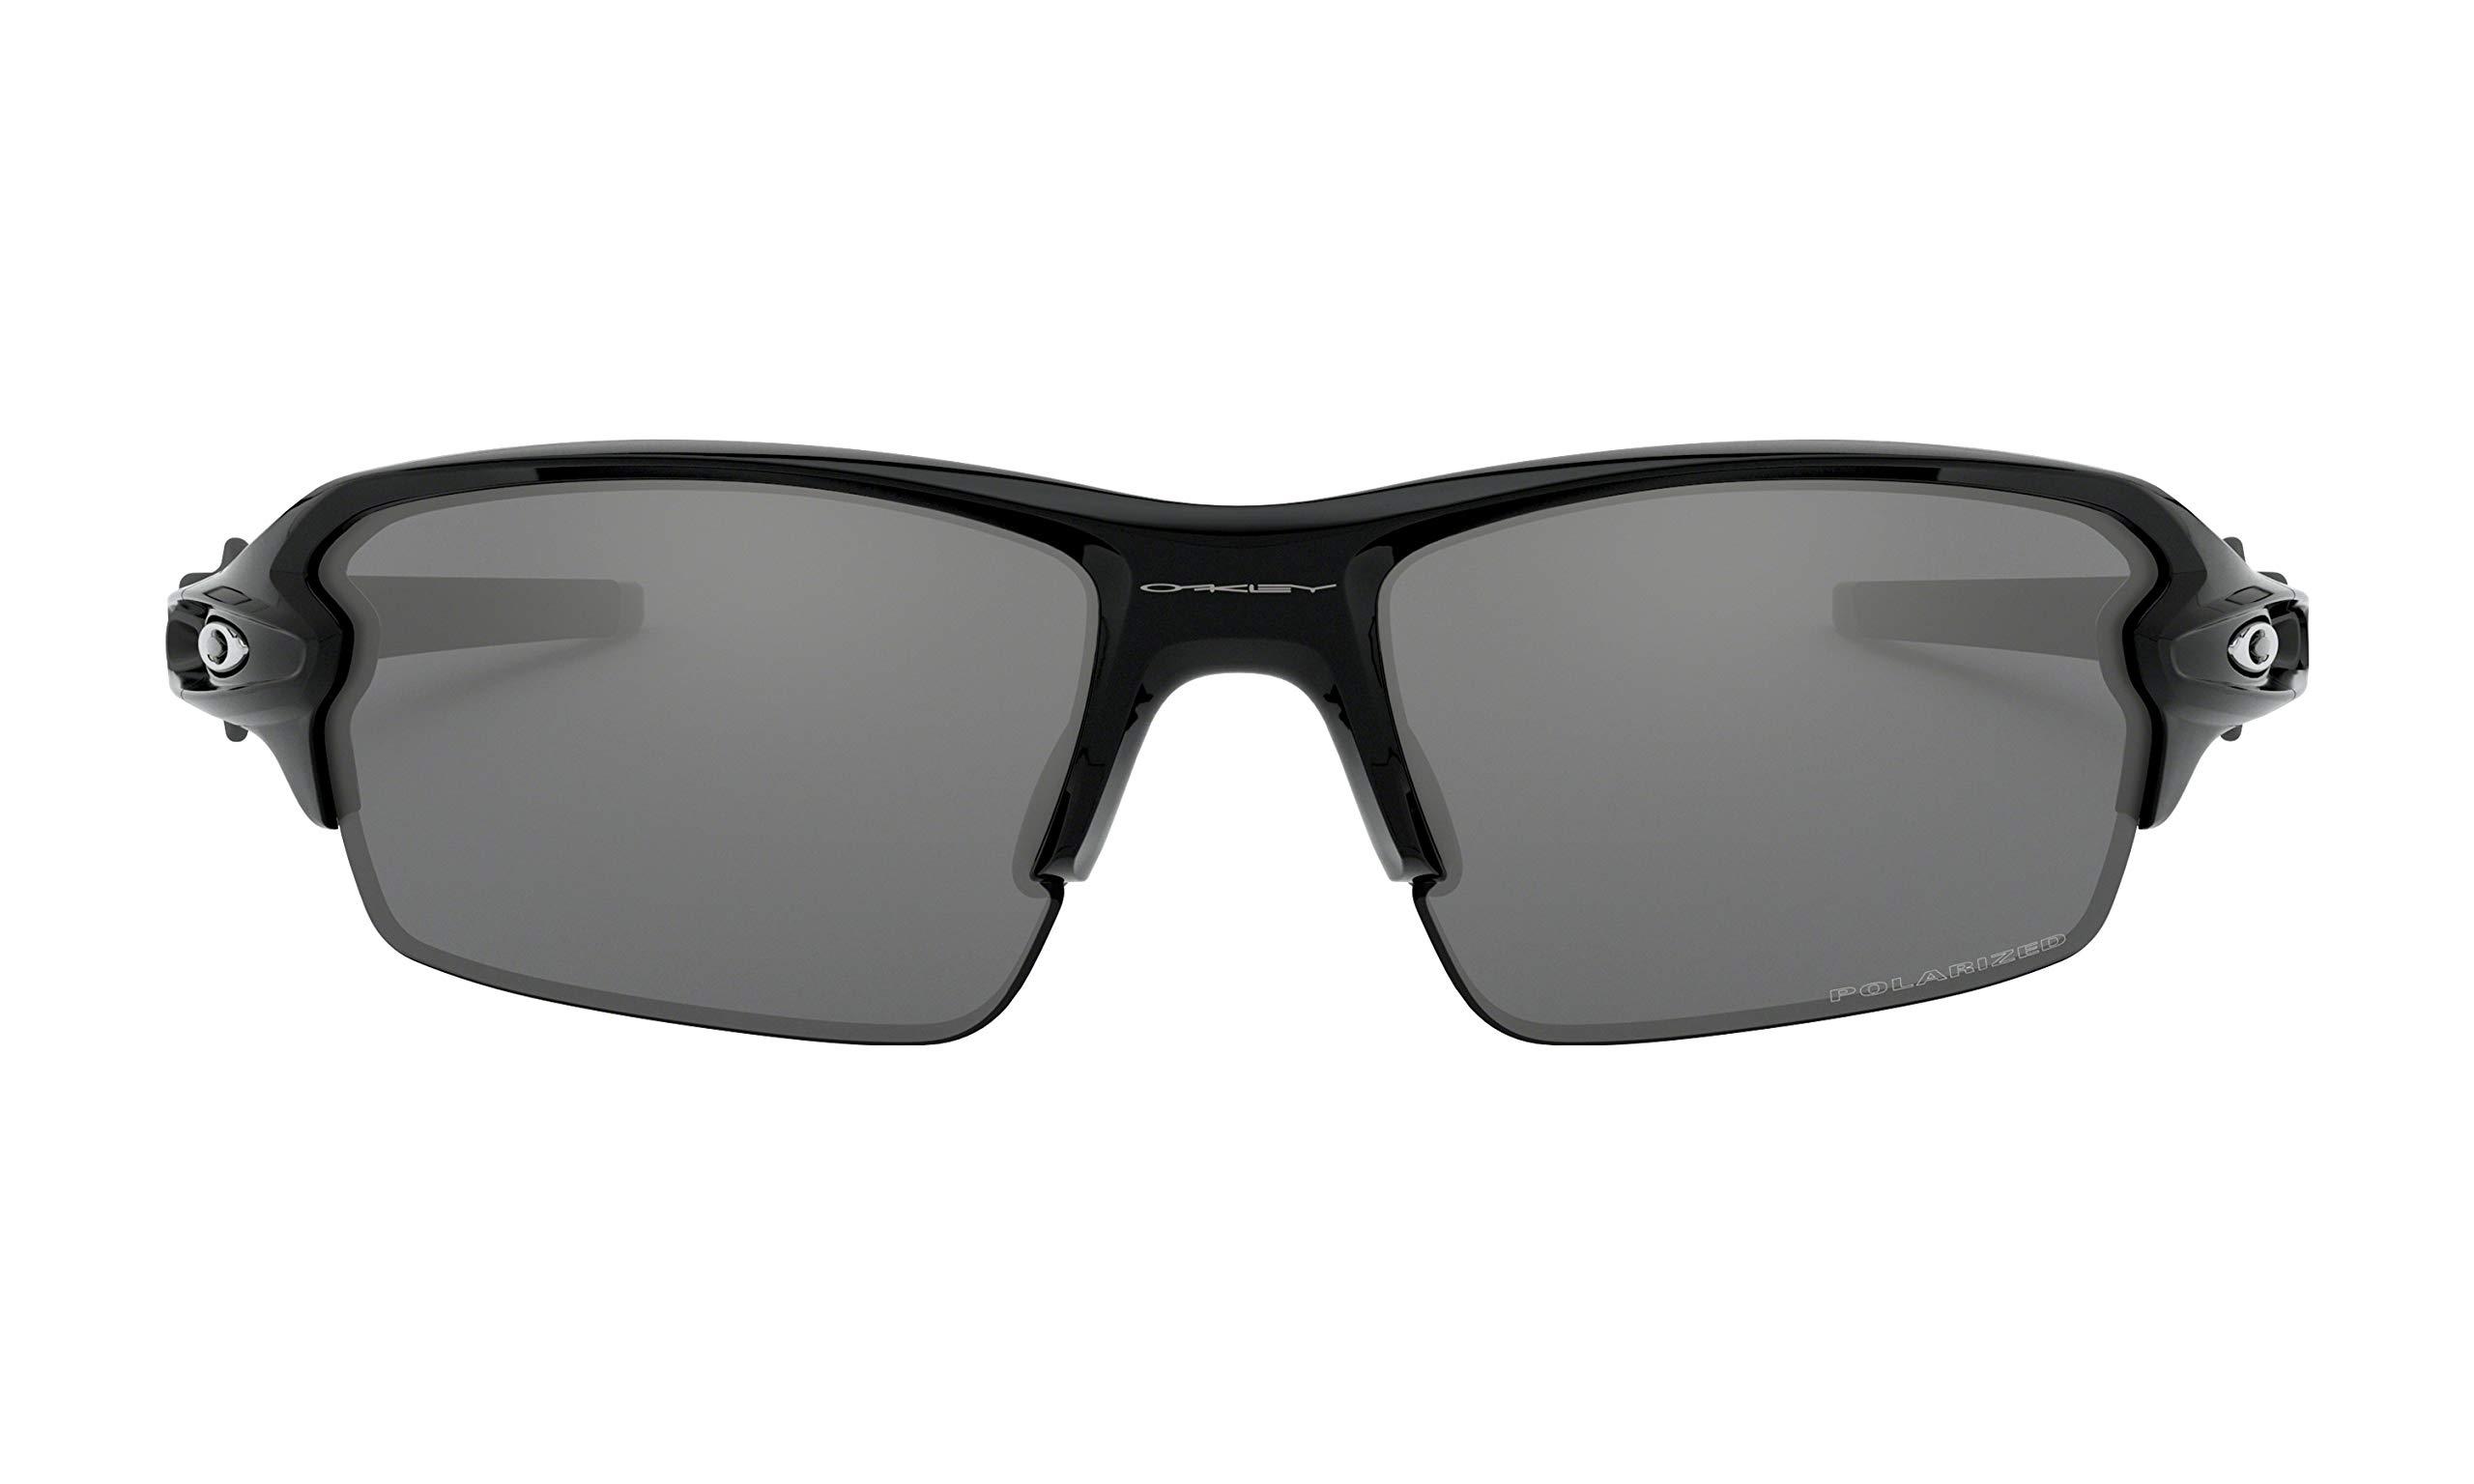 Oakley Flak 2.0 Sunglasses (Polished Black Frame, Black Iridium Polarized Lens), Lens Cleaning Kit and Ellipse O Carbonfiber Hard Case by Oakley